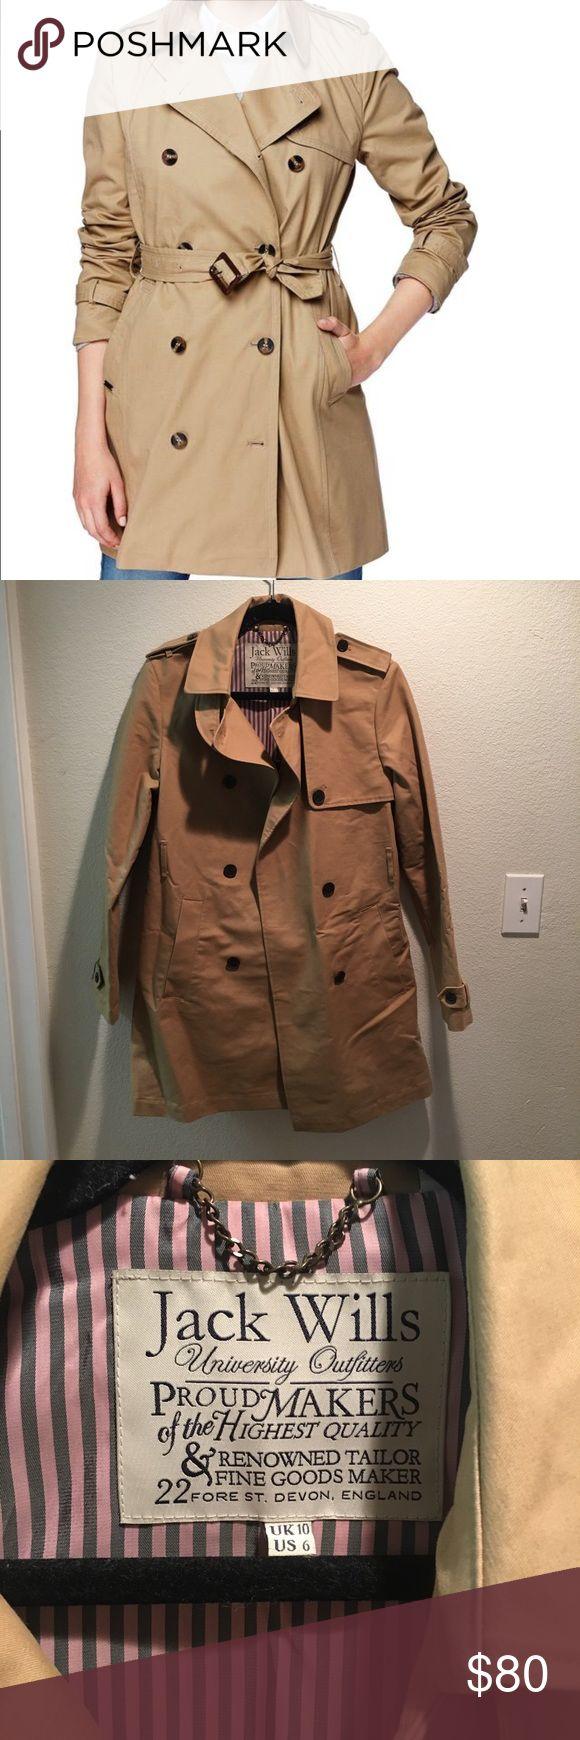 Jack Wills Trench Coat Jack Wills Trench Coat, perfect condition, prestigious brand from U.K. Size US 6 Jack Wills Jackets & Coats Trench Coats